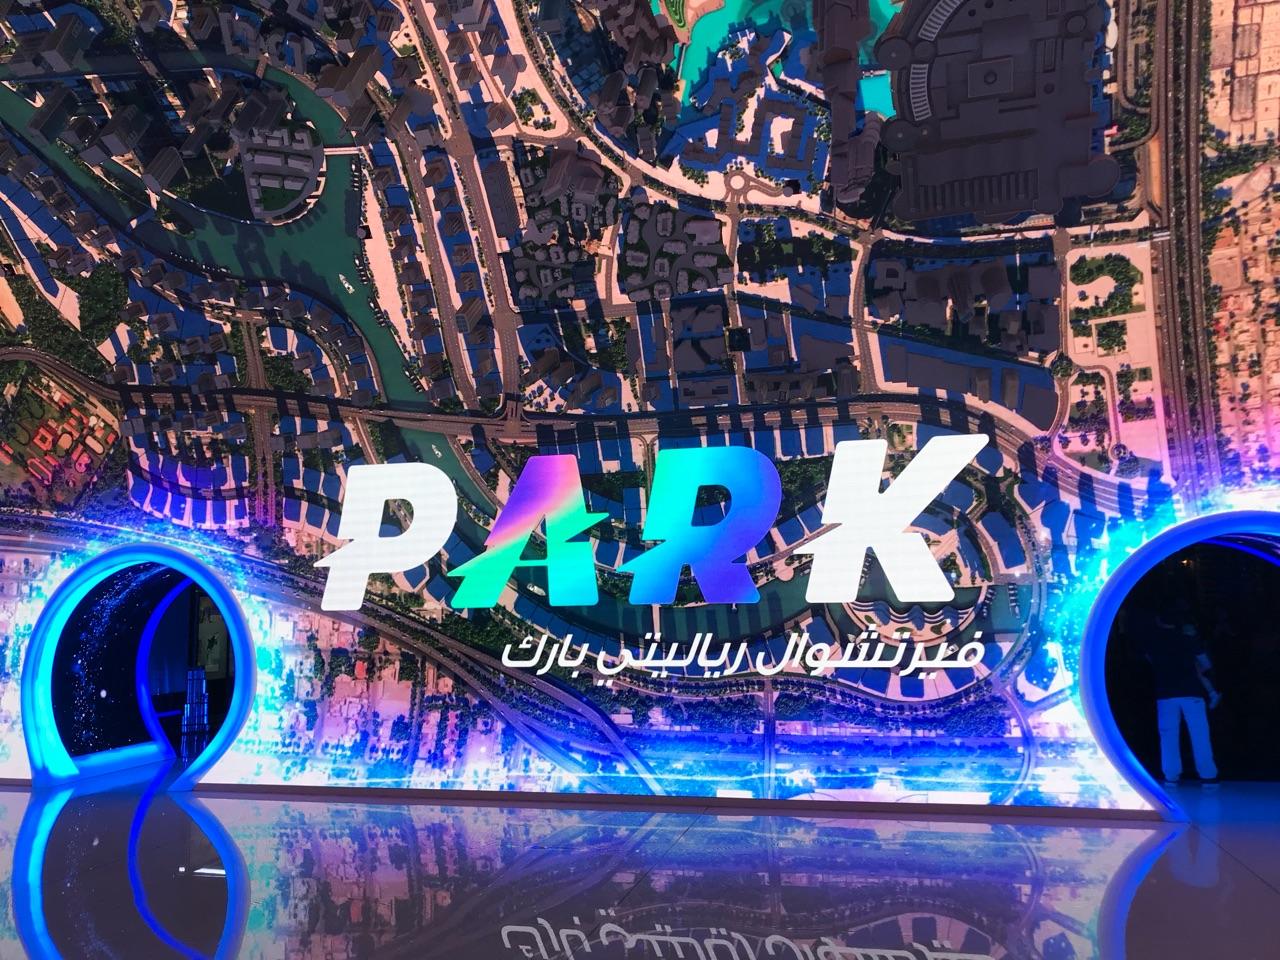 VRPark_8.jpg